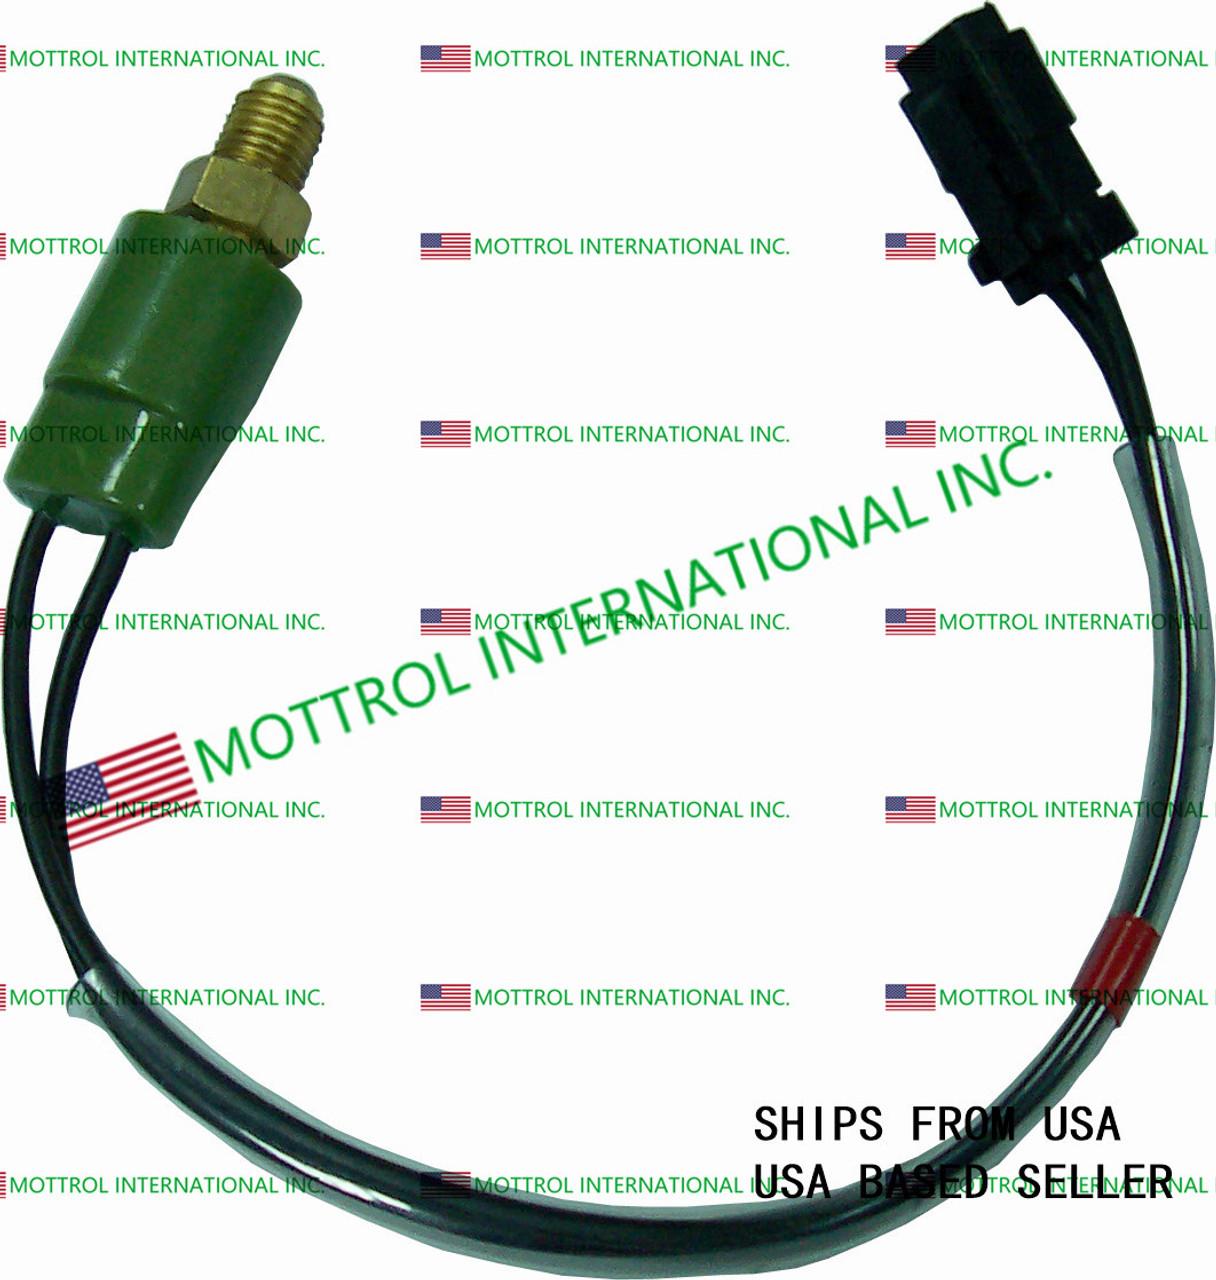 106-0180X03 119-9985 Pressure Switch for Caterpillar CAT E325 E320 E317 #Q119 ZX